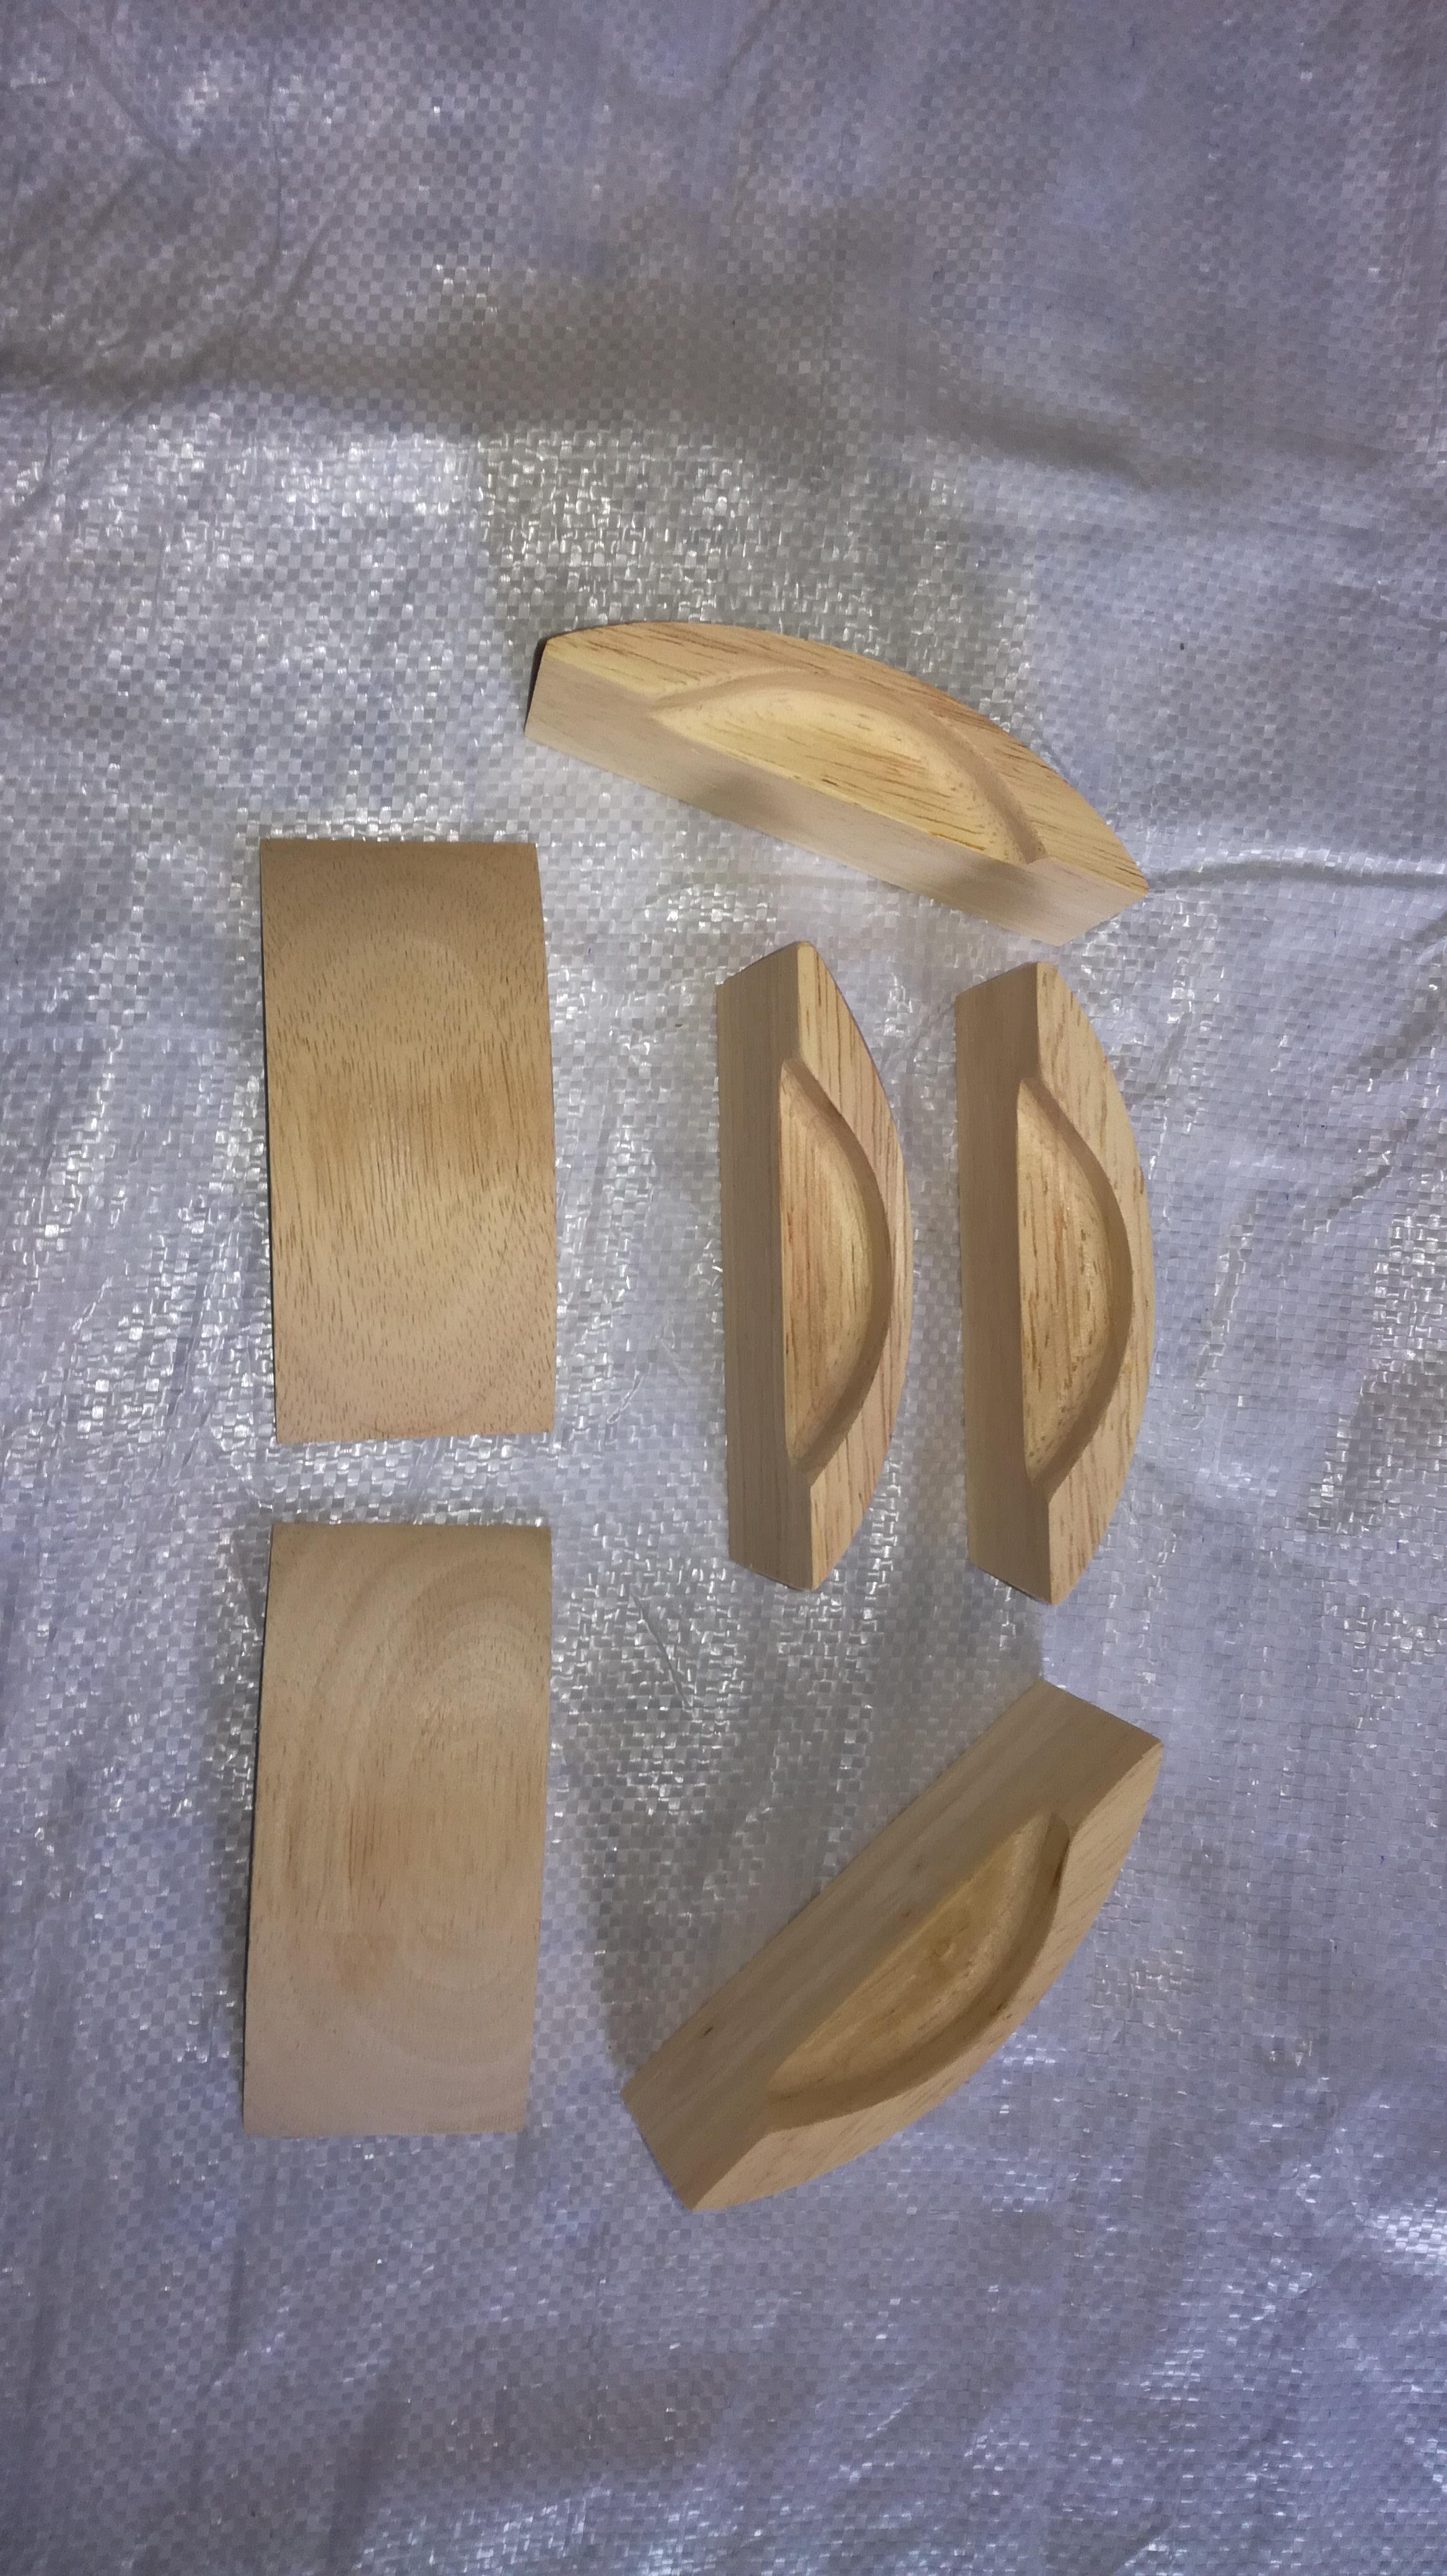 CT906C形、木器配件、抽屉配件 抽屉把手抽屉把手厂家 厂家CT906C形